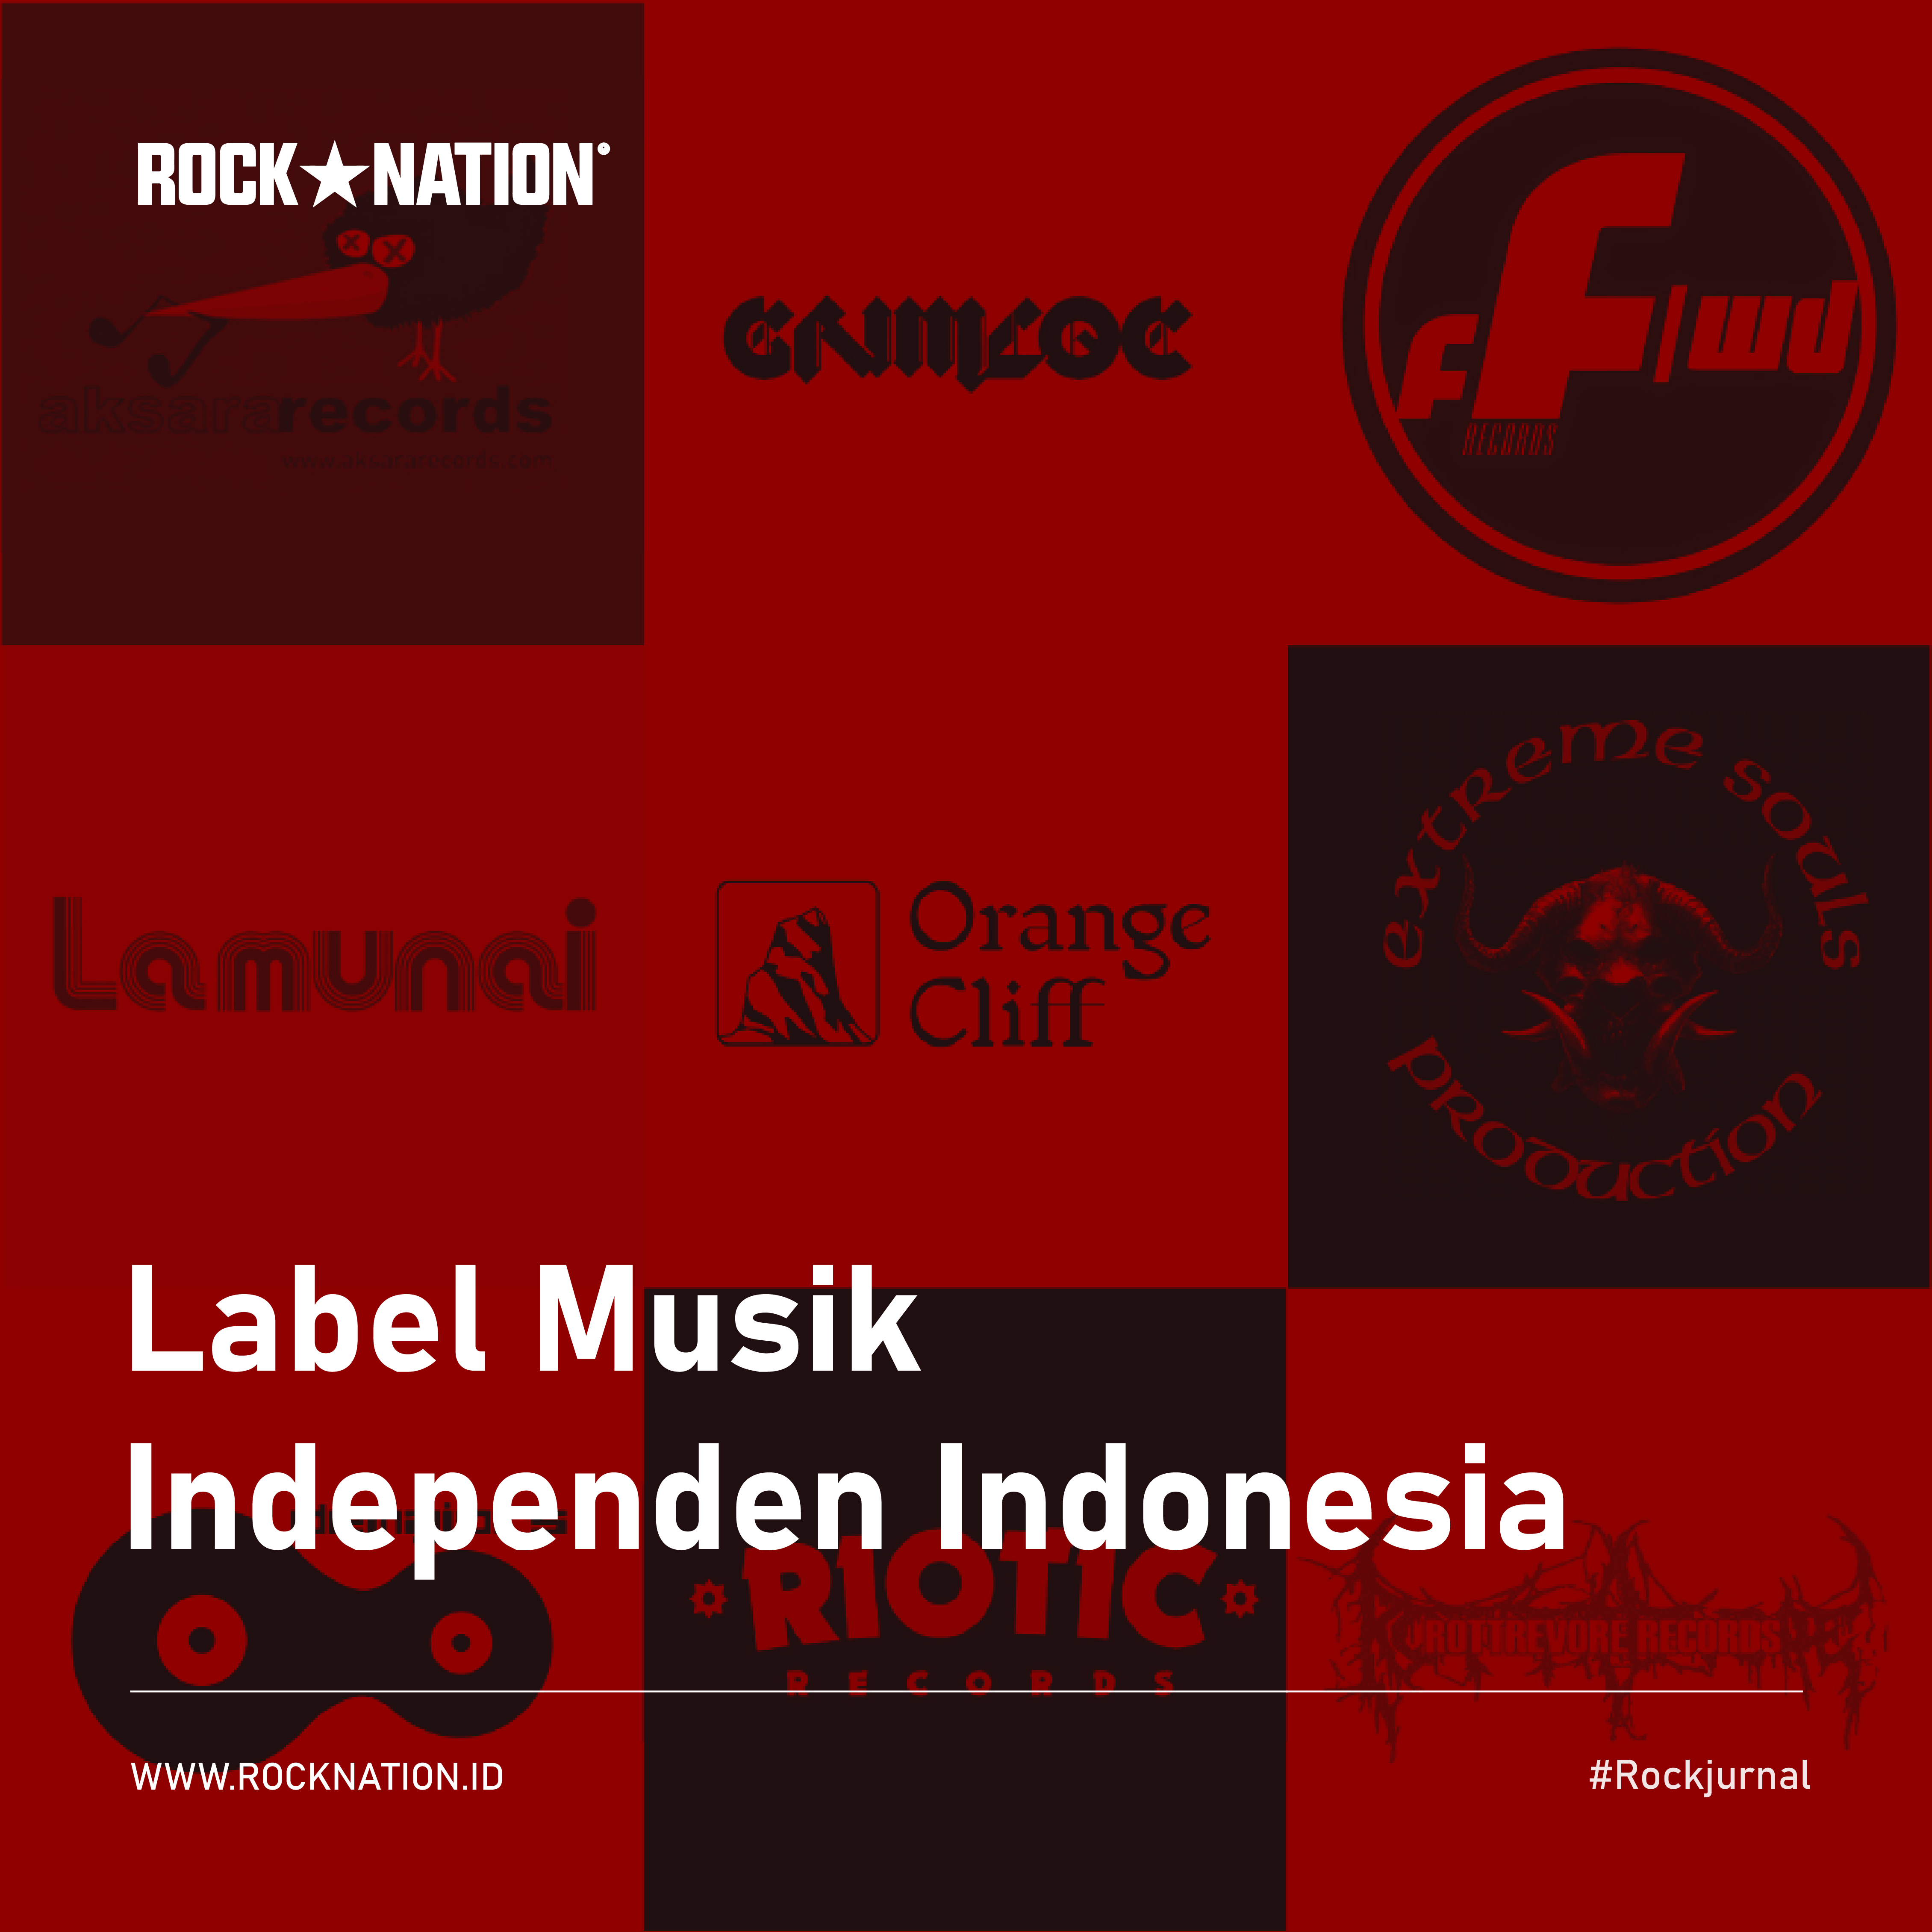 Label Musik Independen Indonesia image